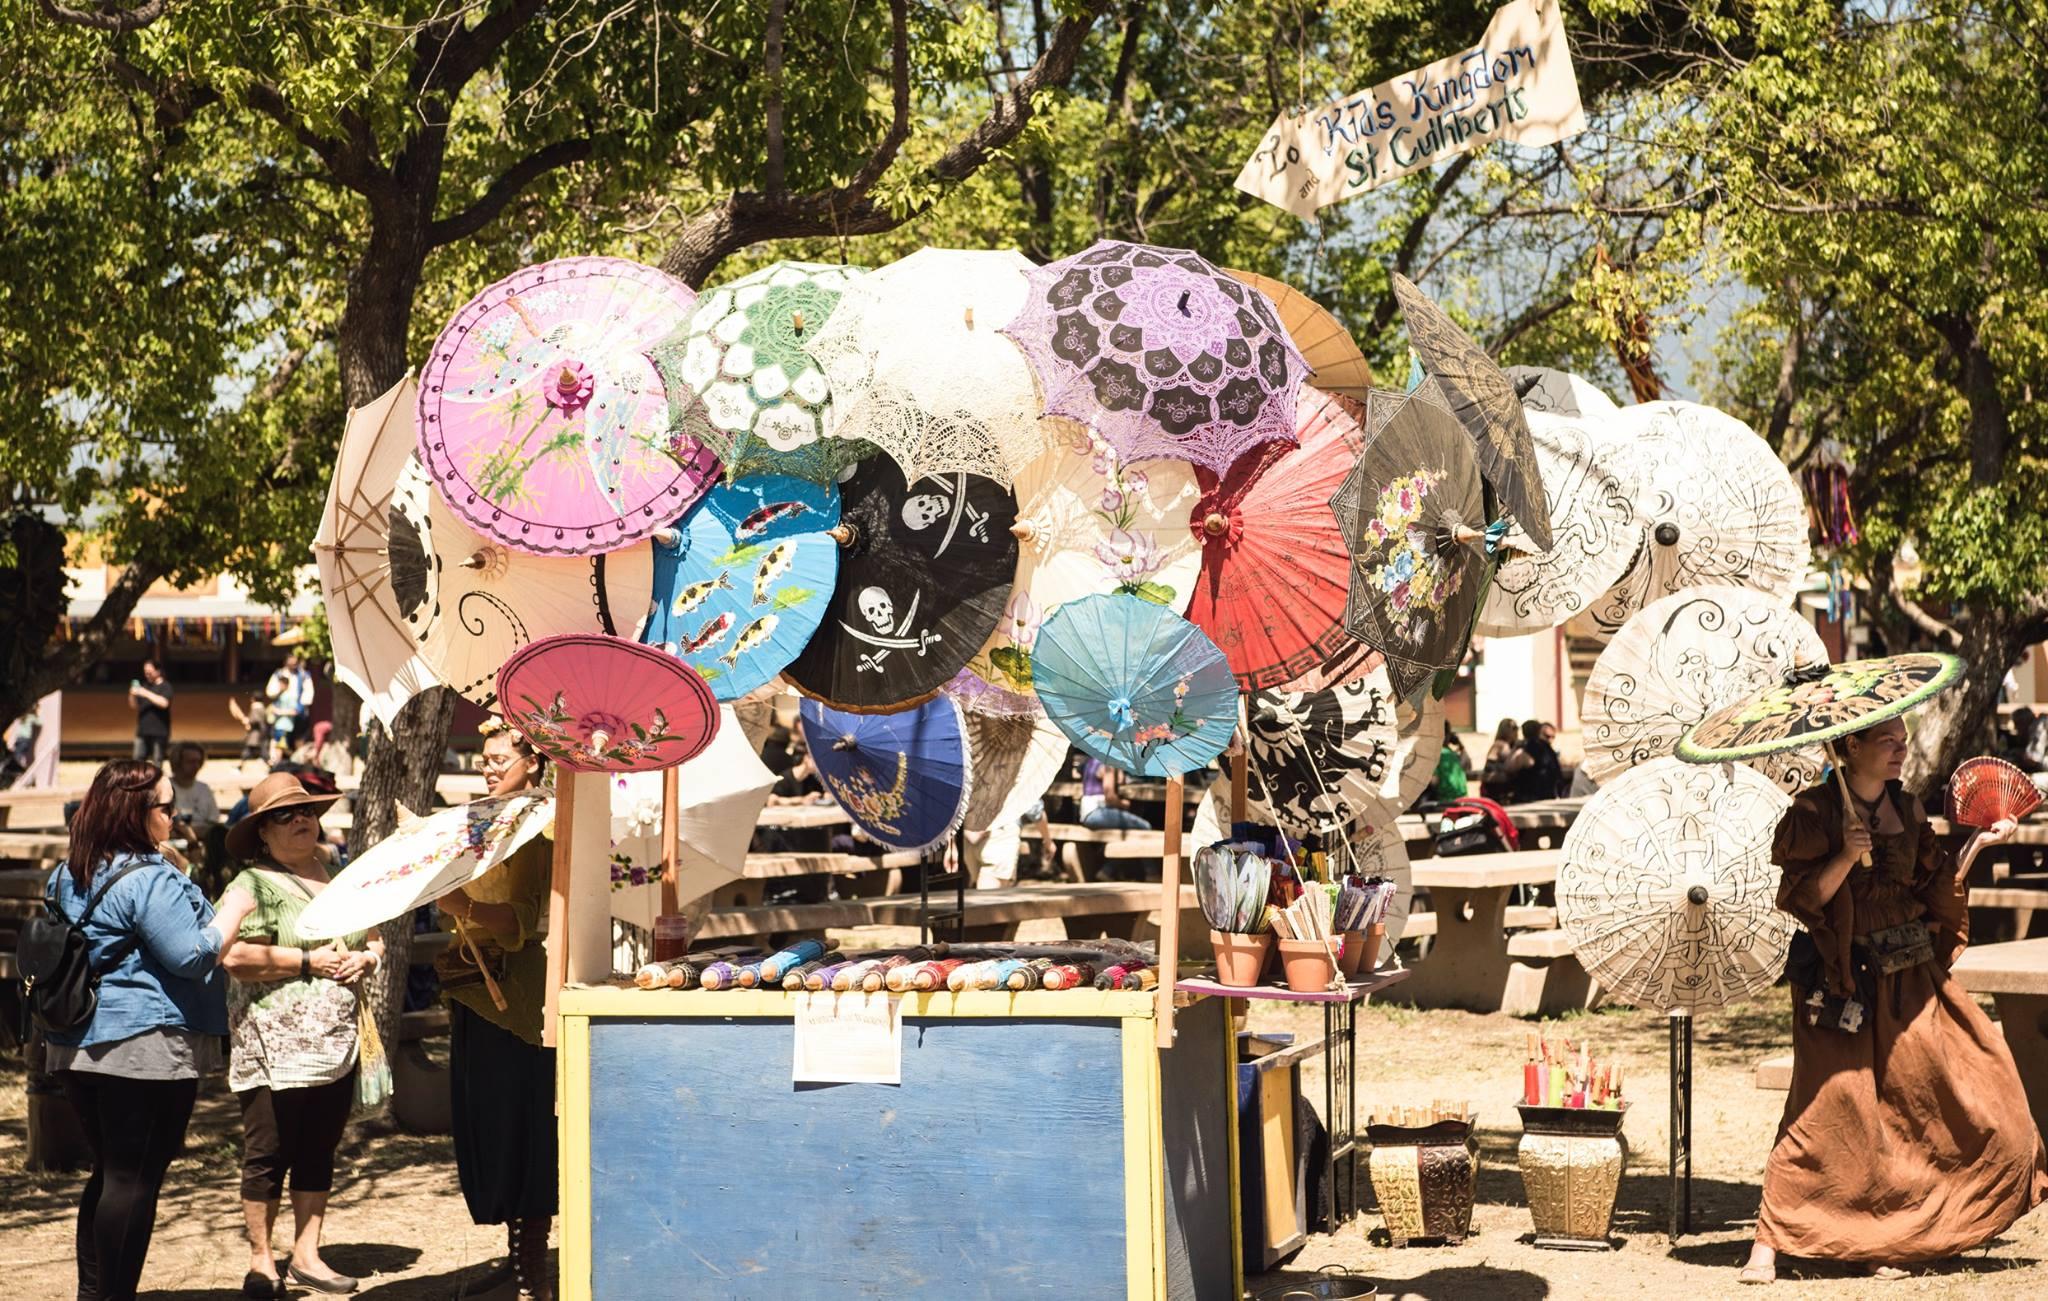 marketplace-umbrella-cart - The Original Renaissance Pleasure Faire